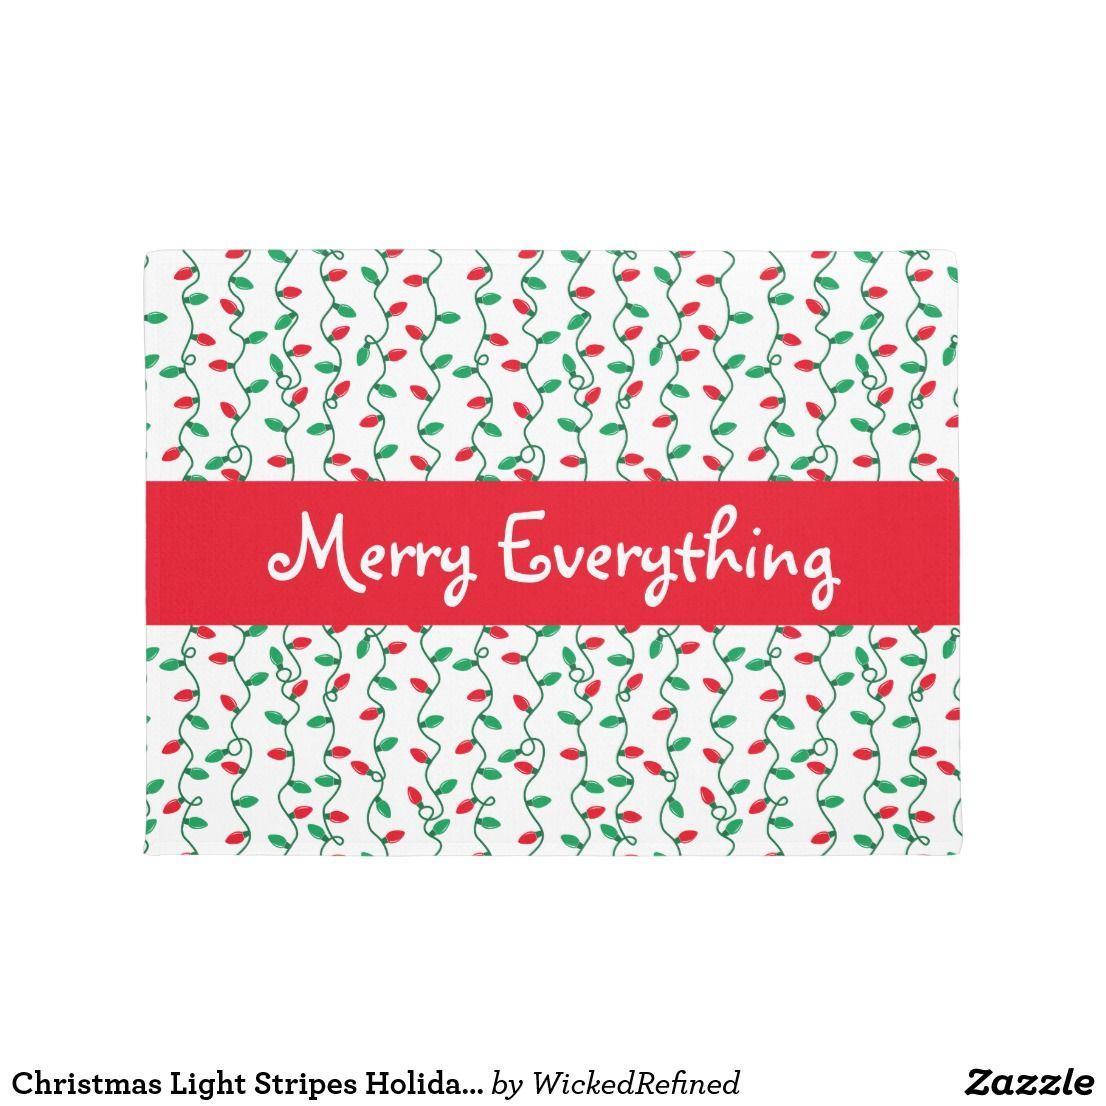 Doormat christmas light stripes holiday greeting by wickedrefined doormat christmas light stripes holiday greeting by wickedrefined perfect for christmas decor christmas kristyandbryce Images